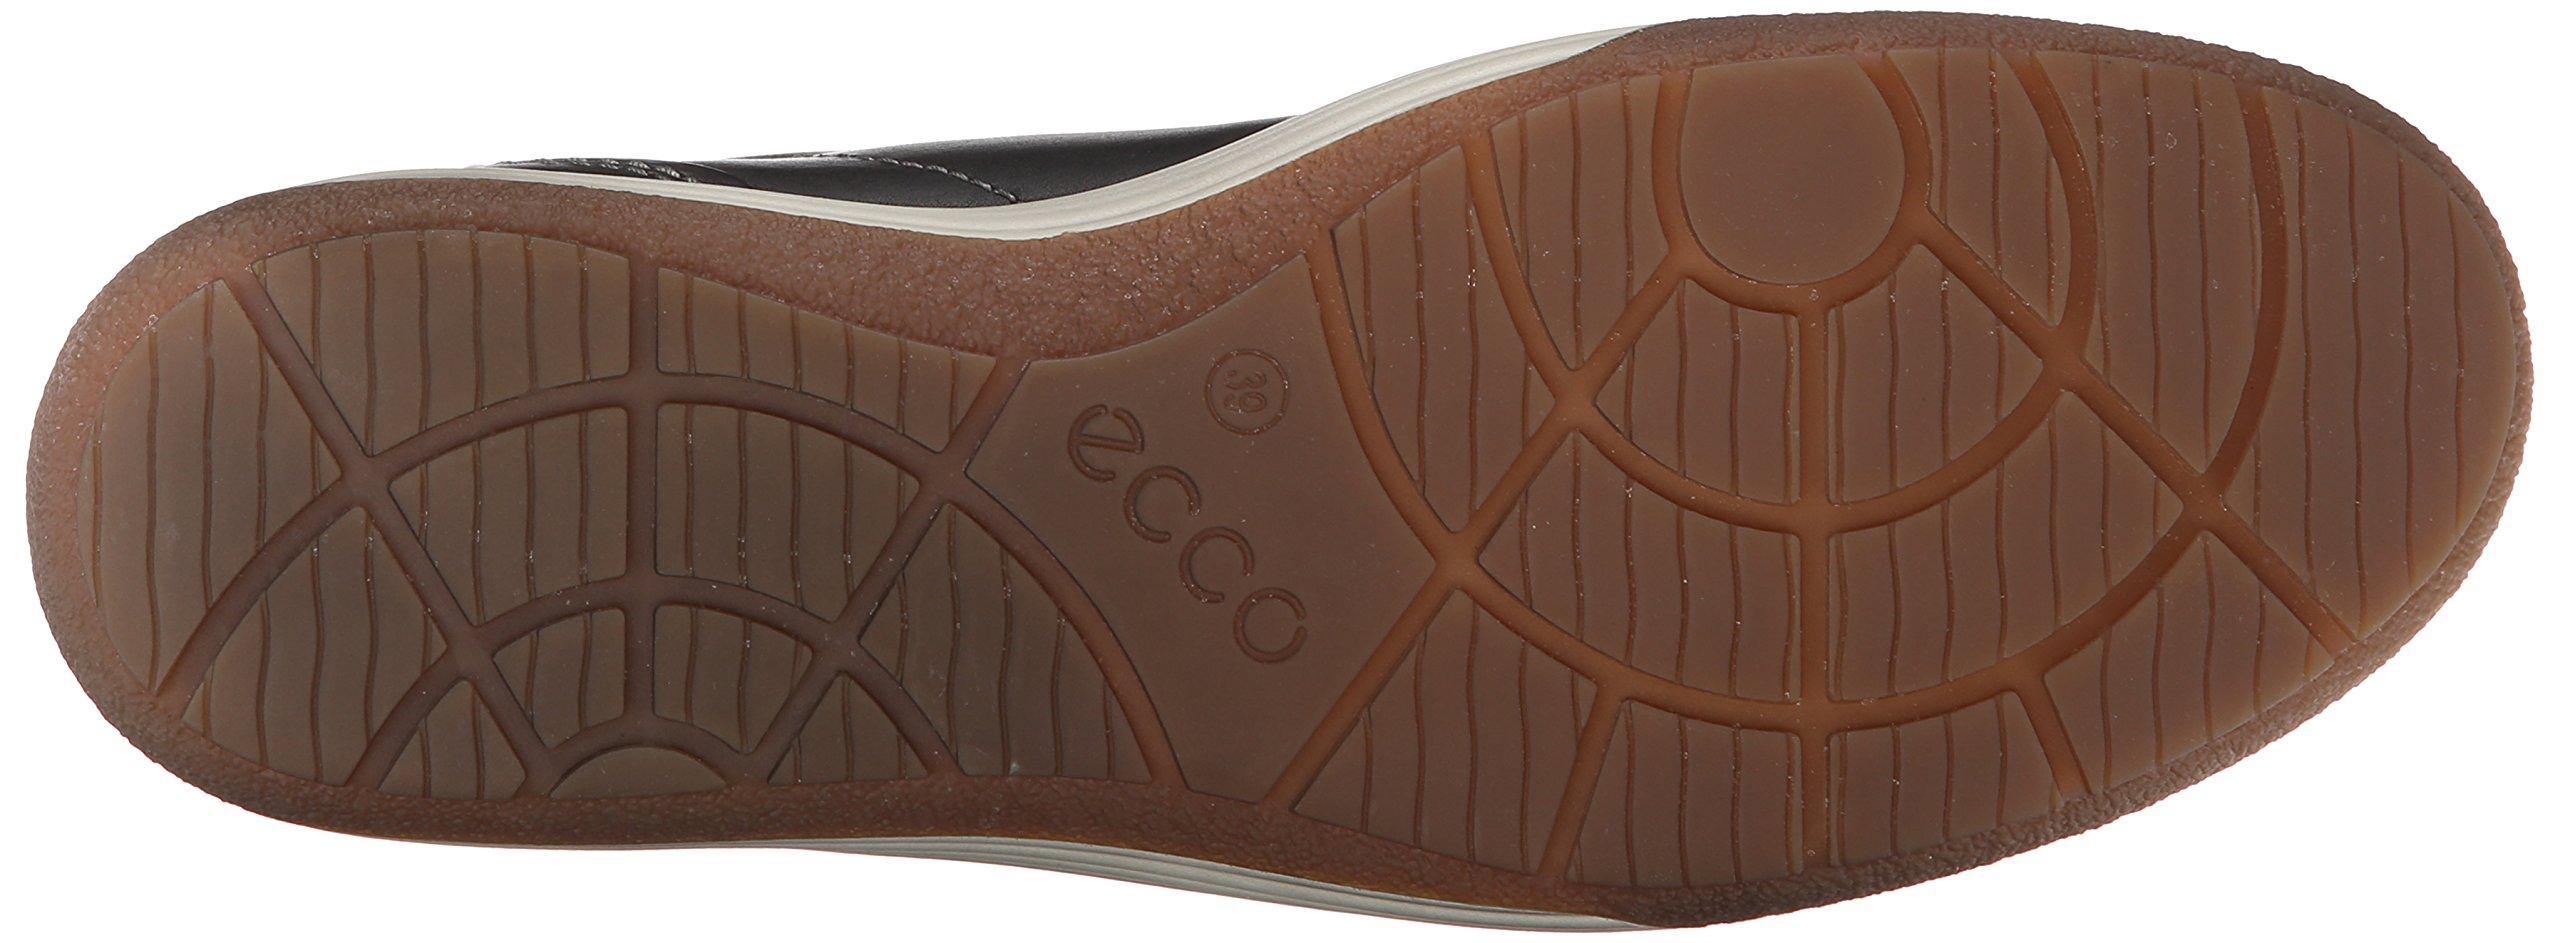 Ecco Footwear Womens Chase II Lace Shoe, Black, 39 EU/8-8.5 M US by ECCO (Image #3)